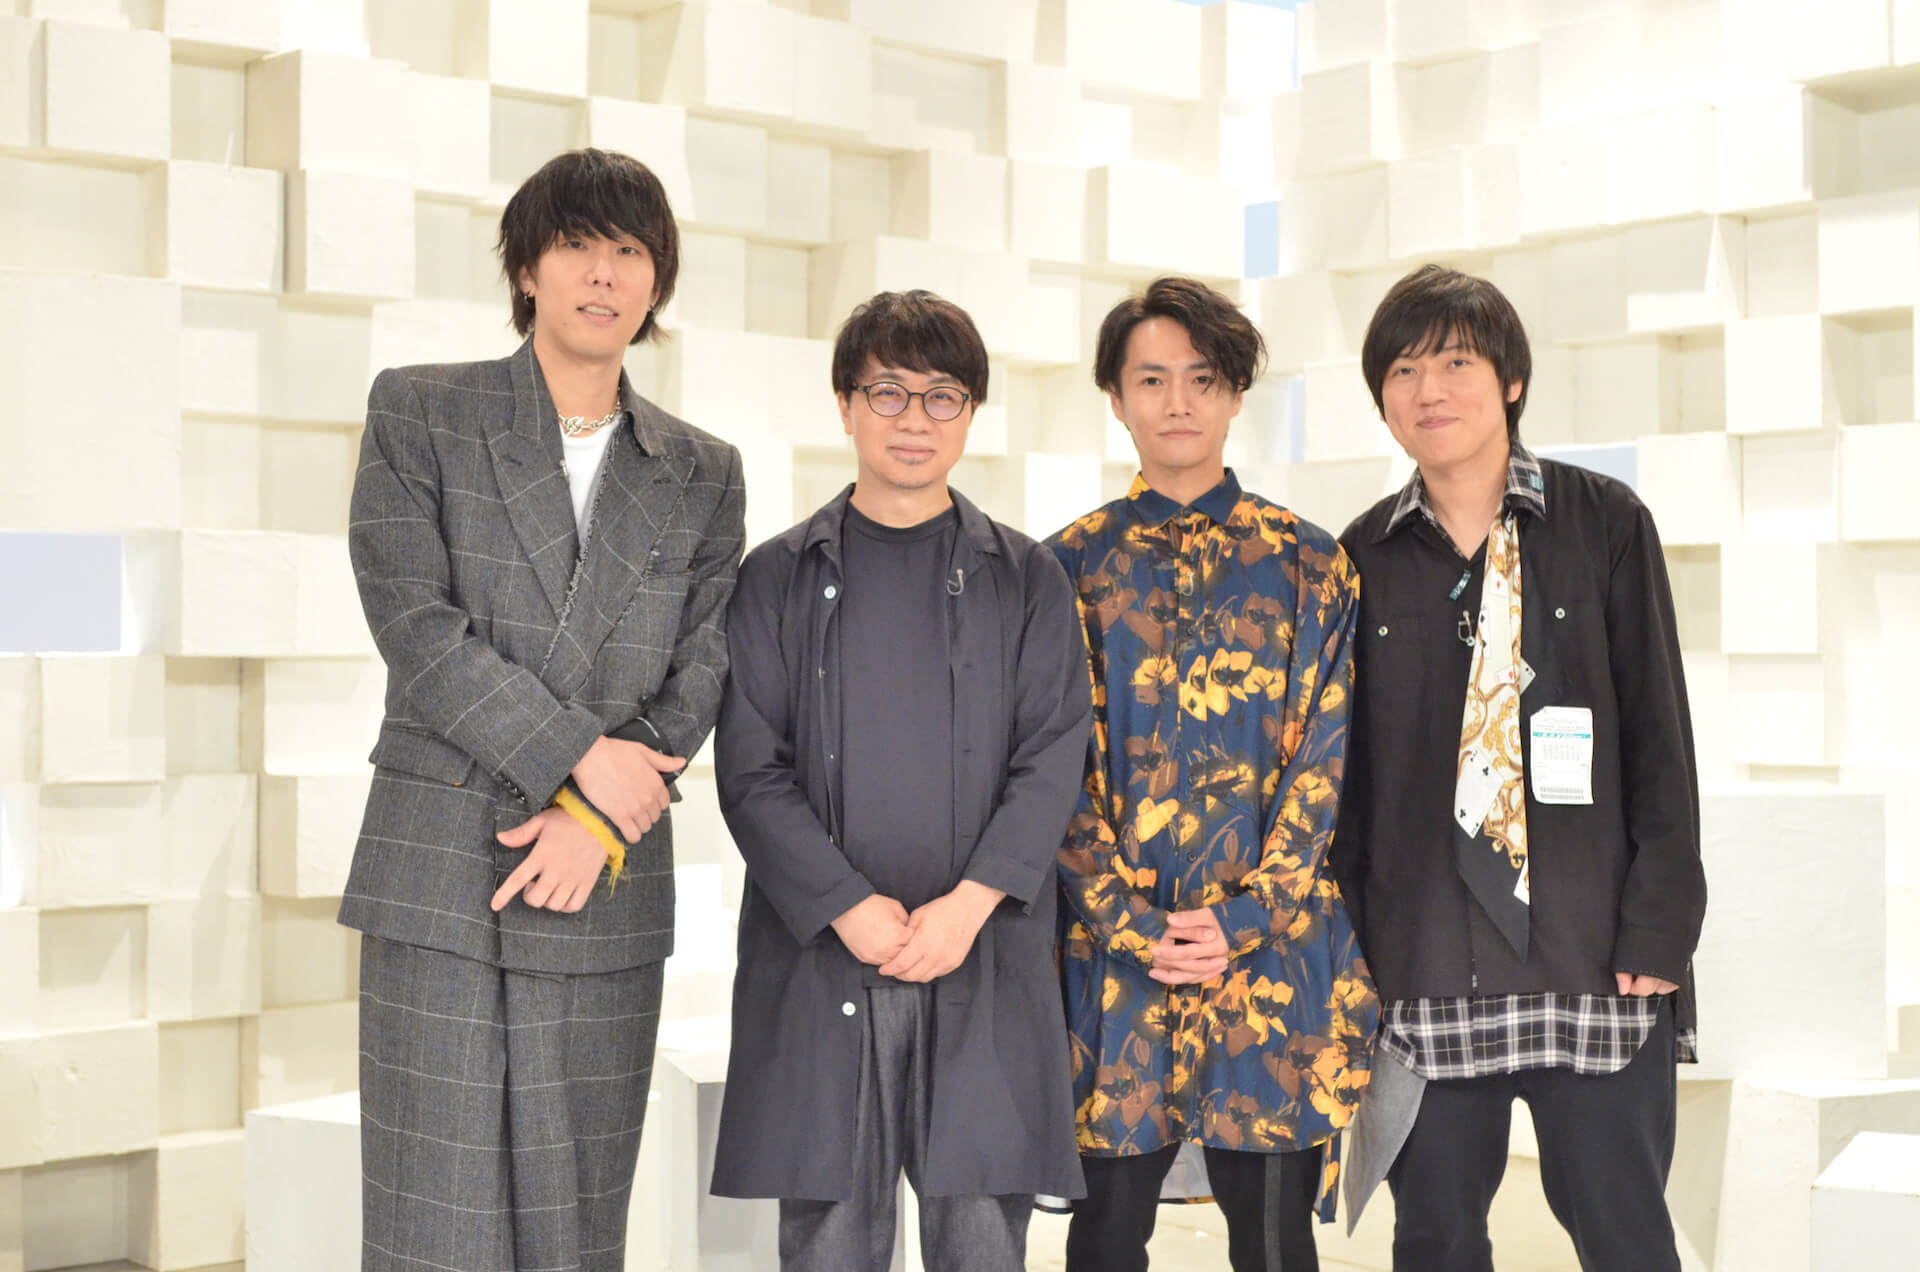 RADWIMPS、NHK総合にて「天気の子」特集番組の放送が決定!4曲のパフォーマンスを披露 art191023_radwimps_nhk_main